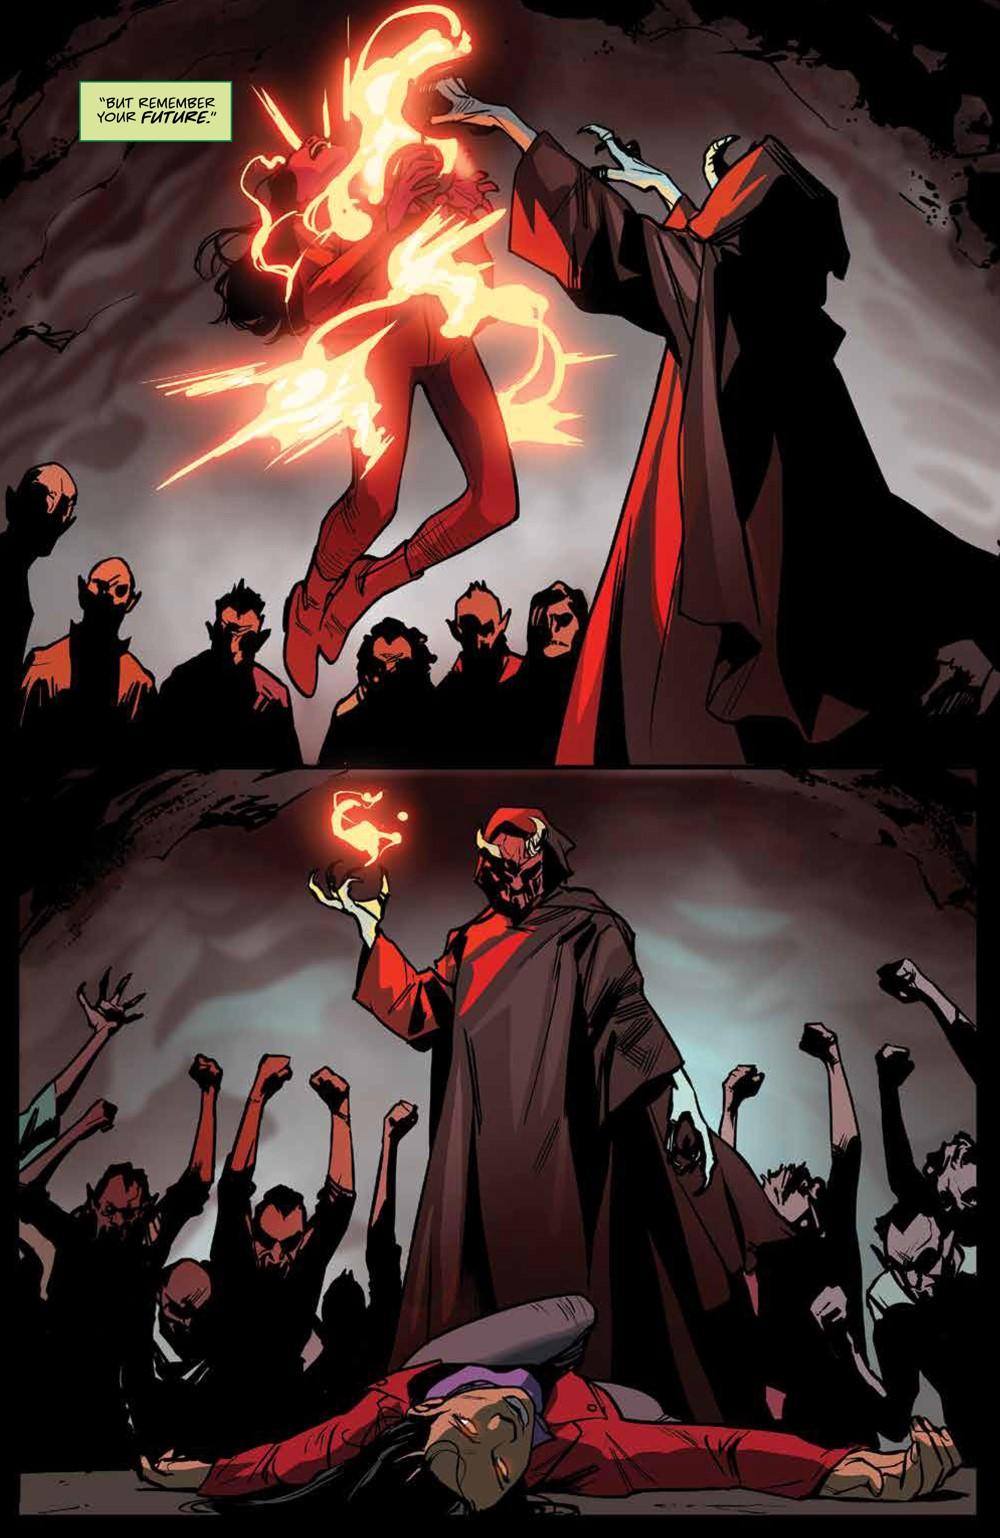 Buffy_v6_SC_PRESS_22 ComicList Previews: BUFFY THE VAMPIRE SLAYER VOLUME 6 SECRETS OF THE SLAYER TP